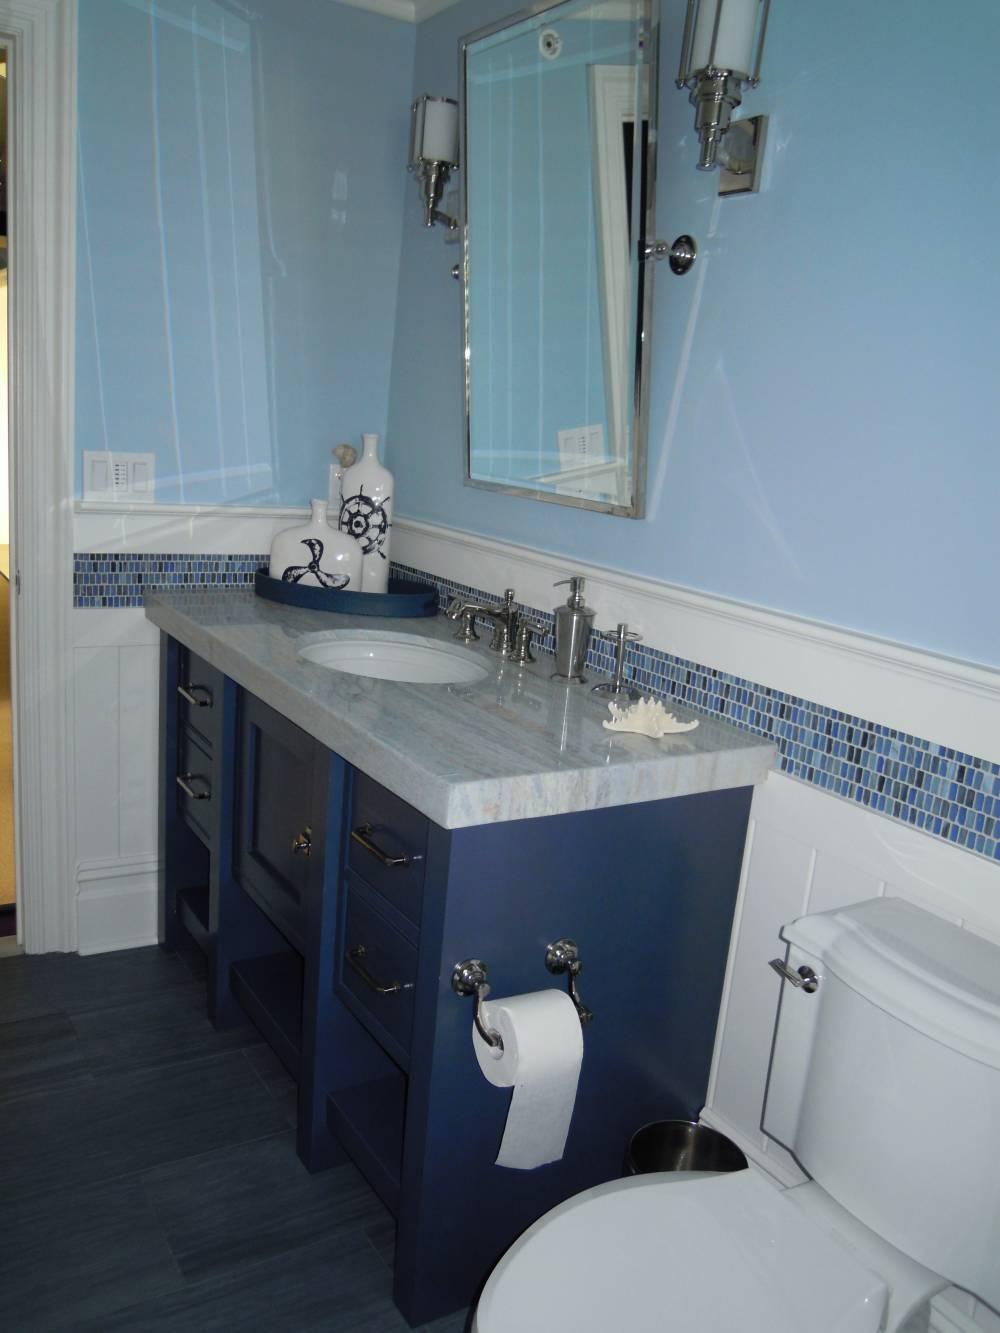 5 Star Home Improvement Services | Dallas TX & Kansas City